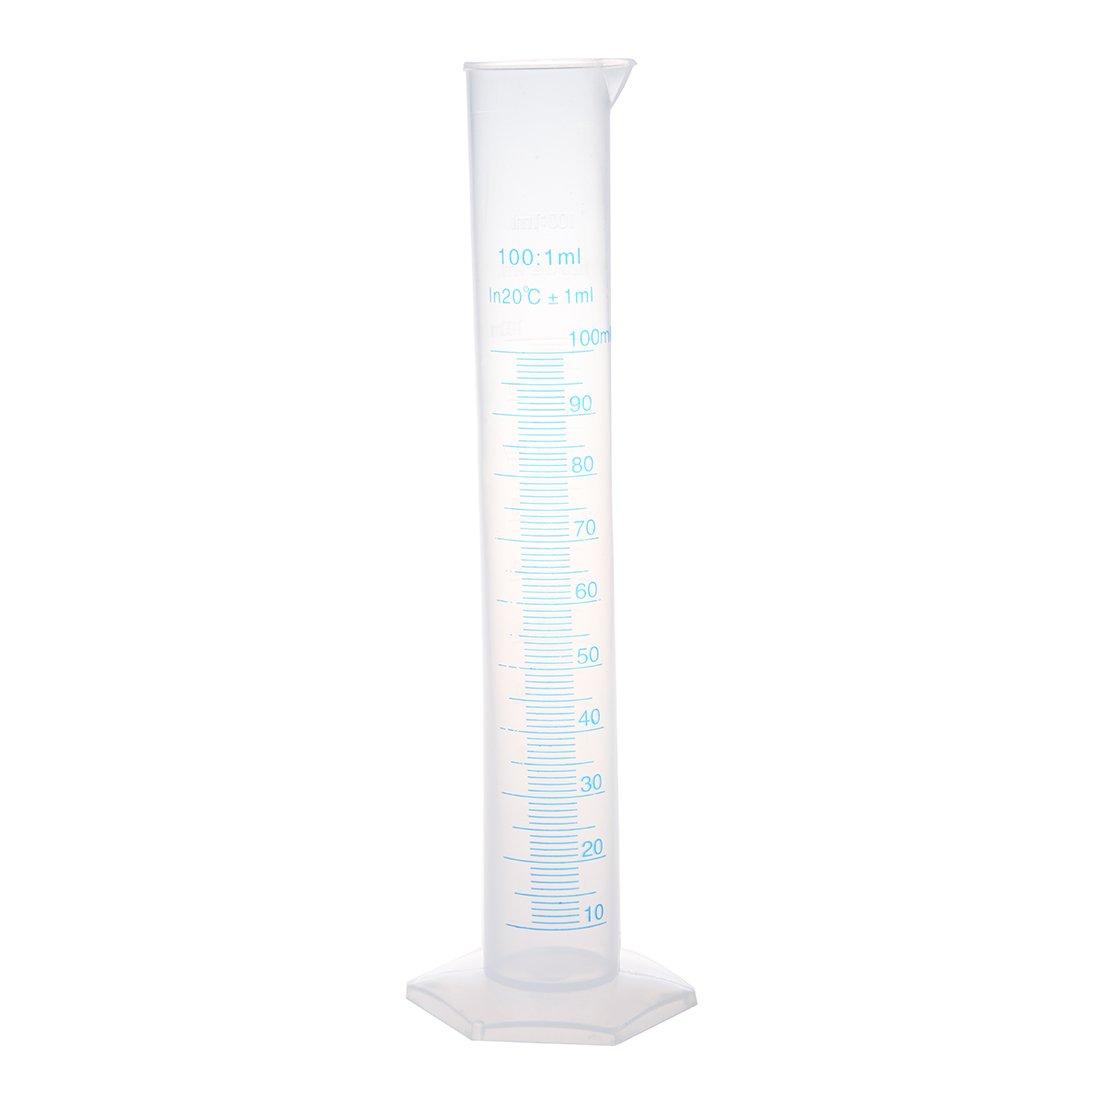 25cm High 100ml Plastic Graduated Cylinder Measuring Cup 1 milliliter SODIAL(R) US-SA-AJD-342342